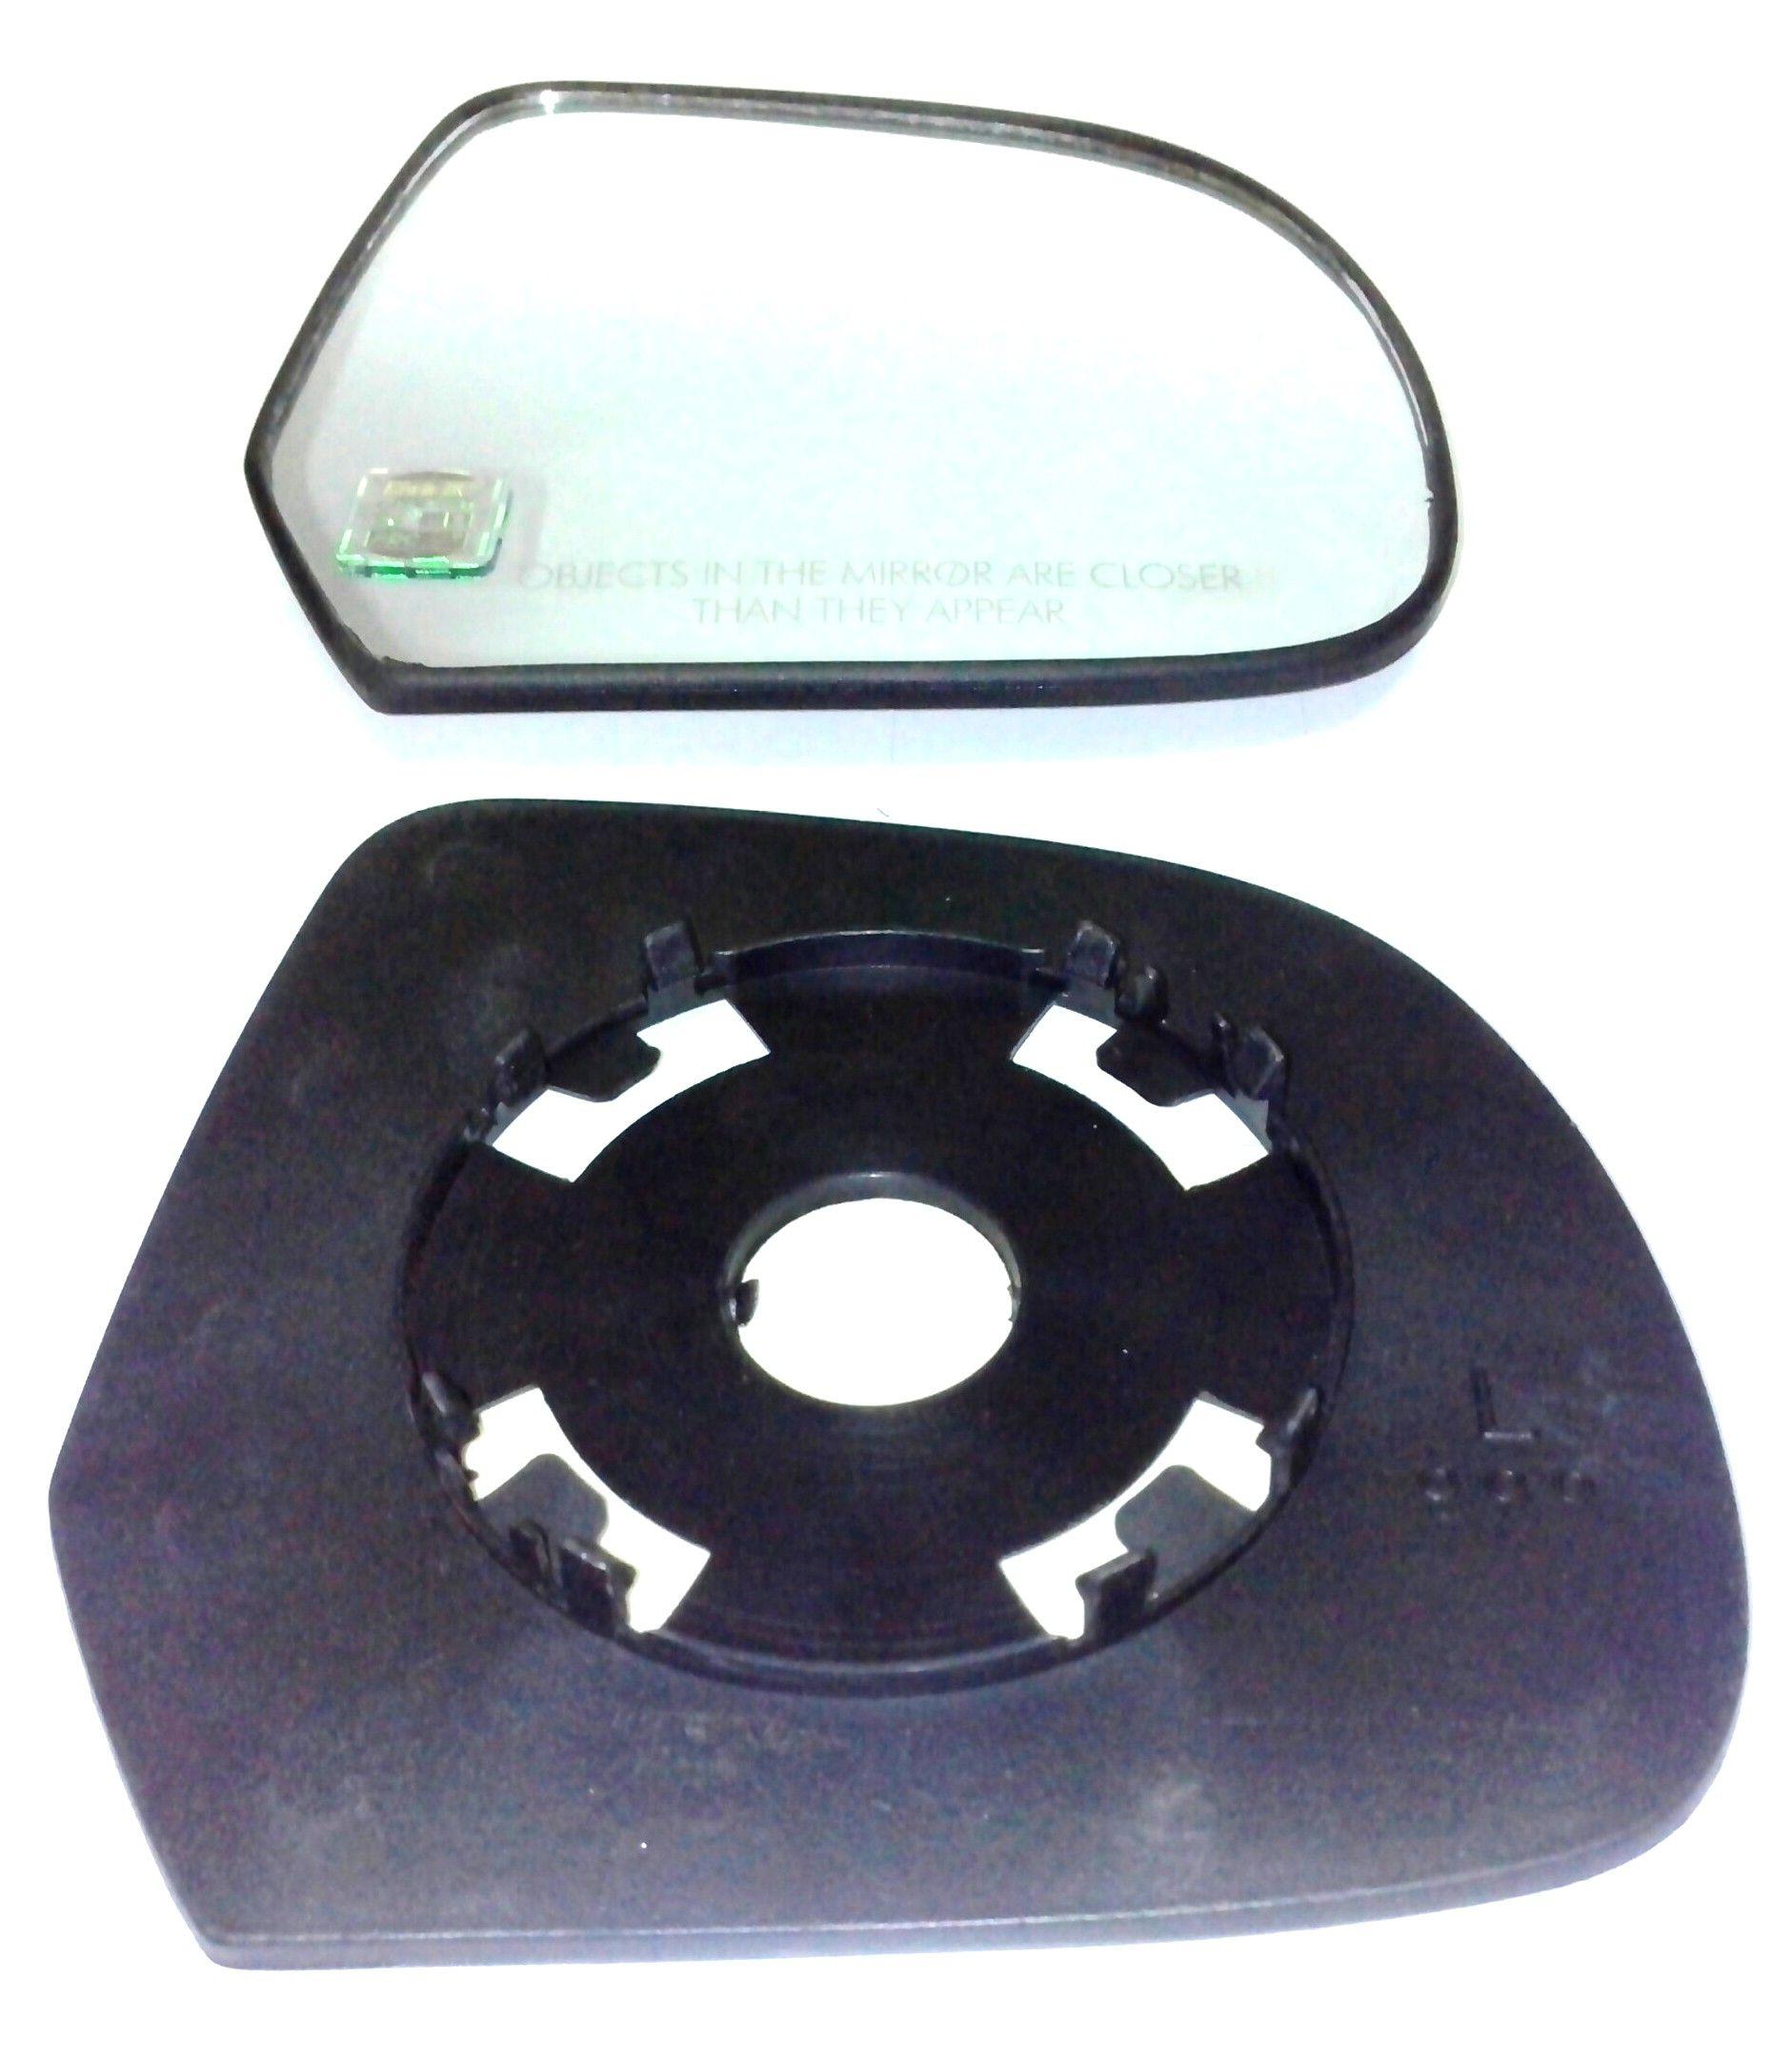 MANTRA-CONVEX MIRROR PLATES (SUB MIRROR PLATES) FOR MAHINDRA XYLO LEFT SIDE